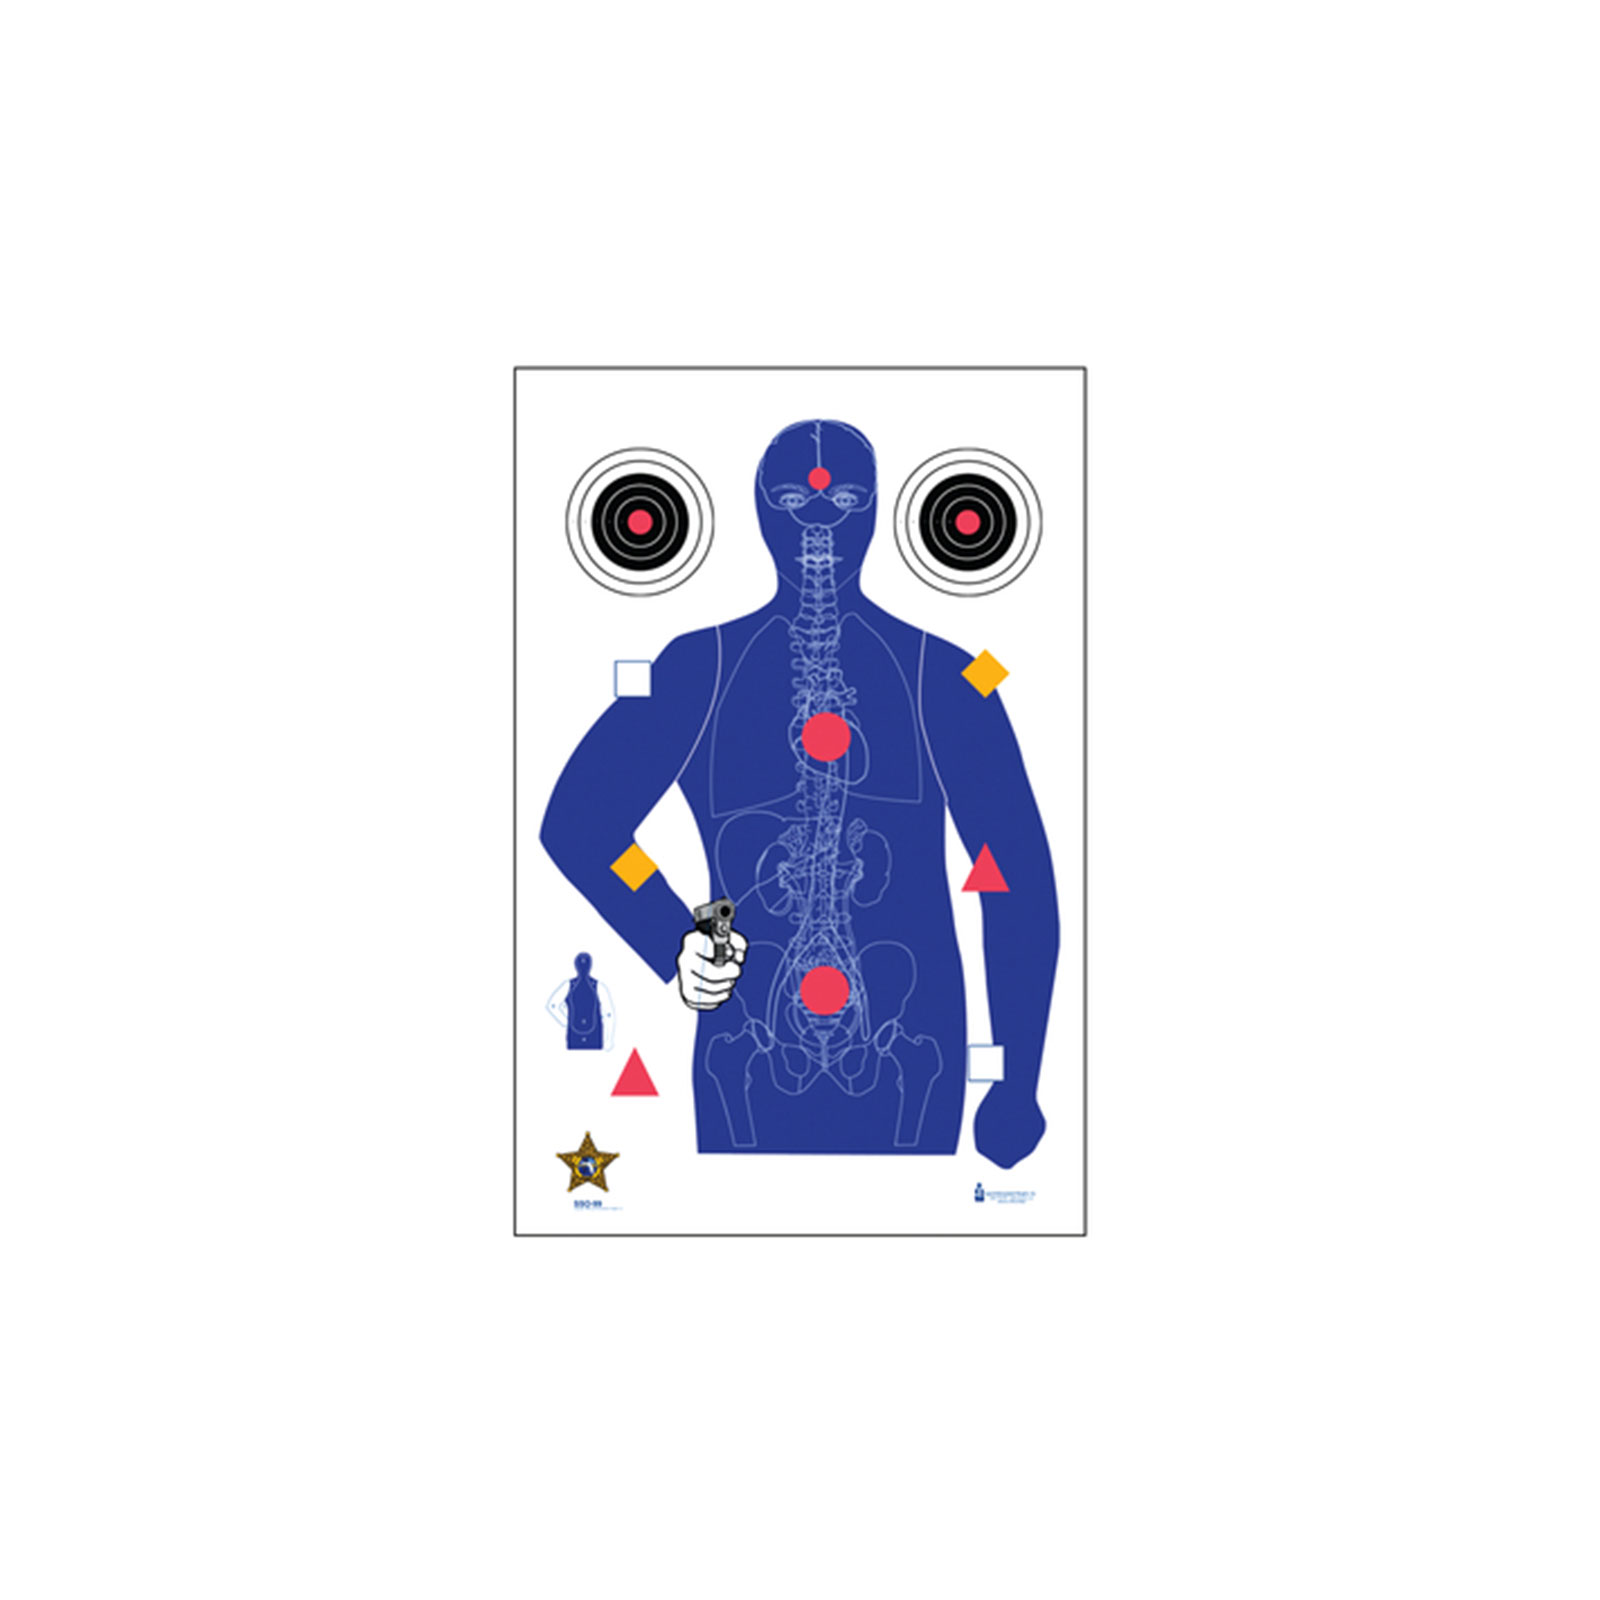 B 21 Police Shooting Targets Law Enforcement Target...